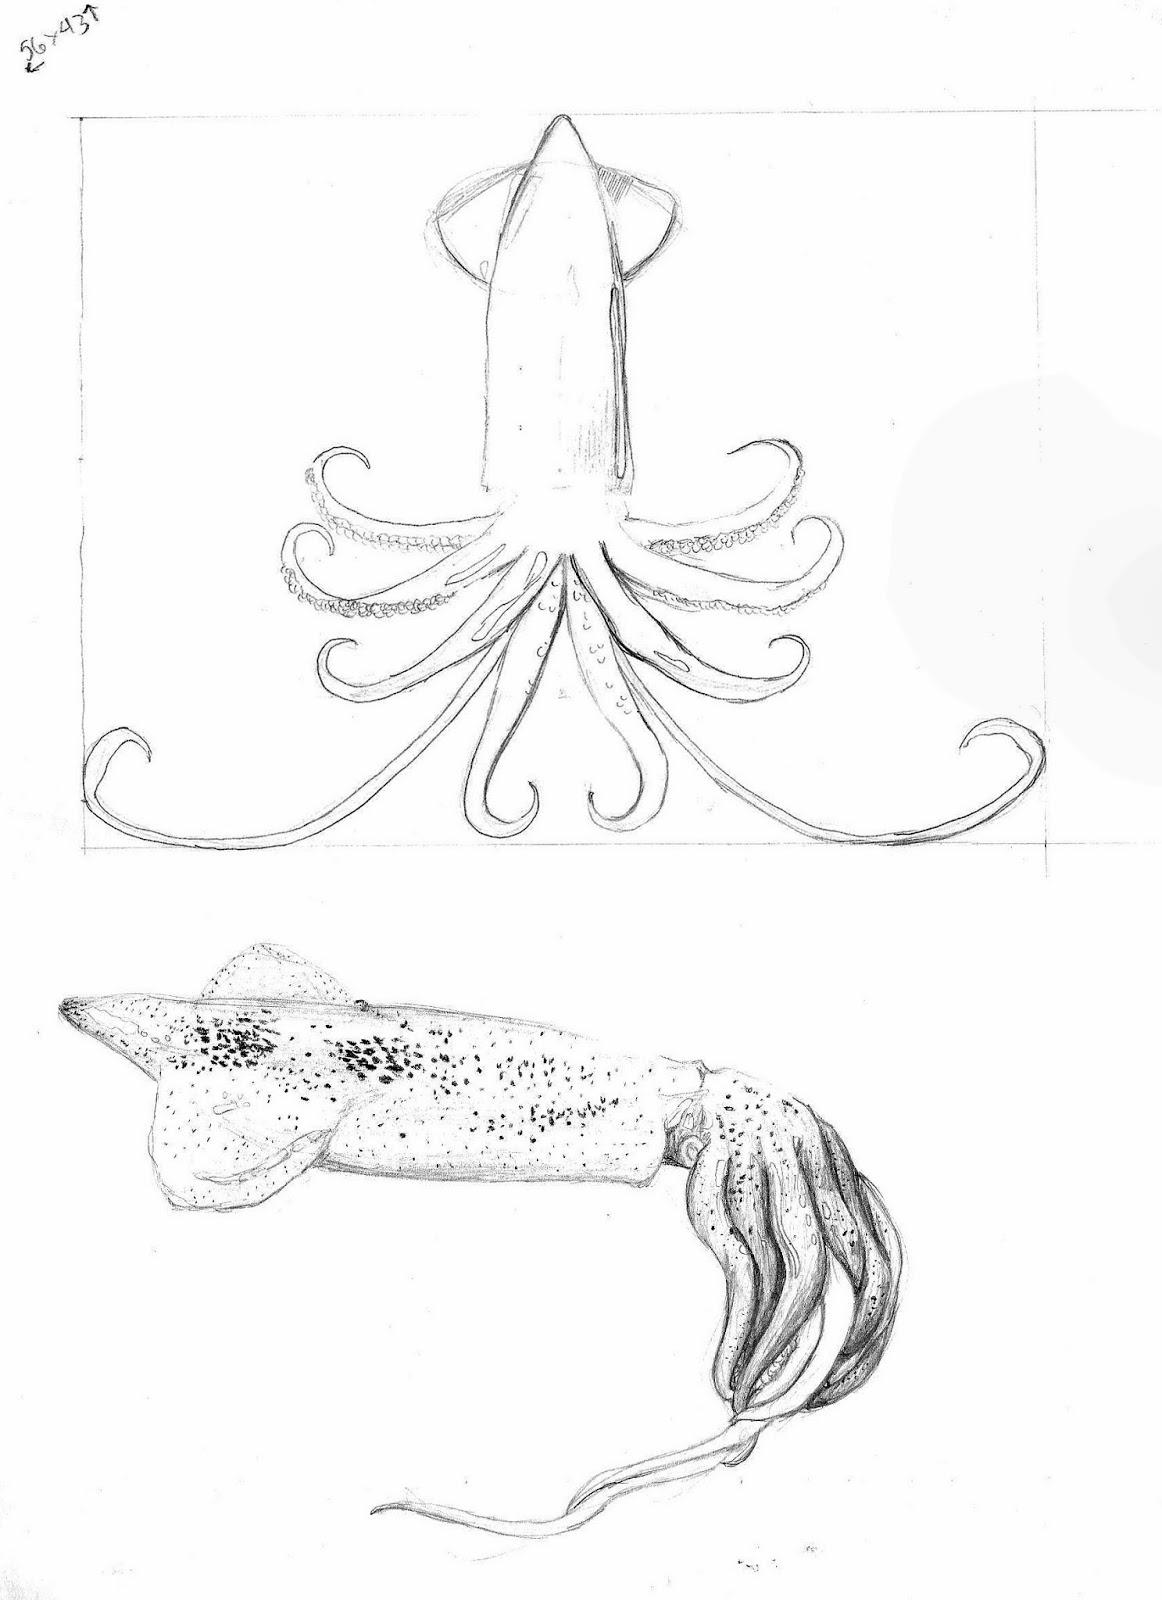 how to draw like inky